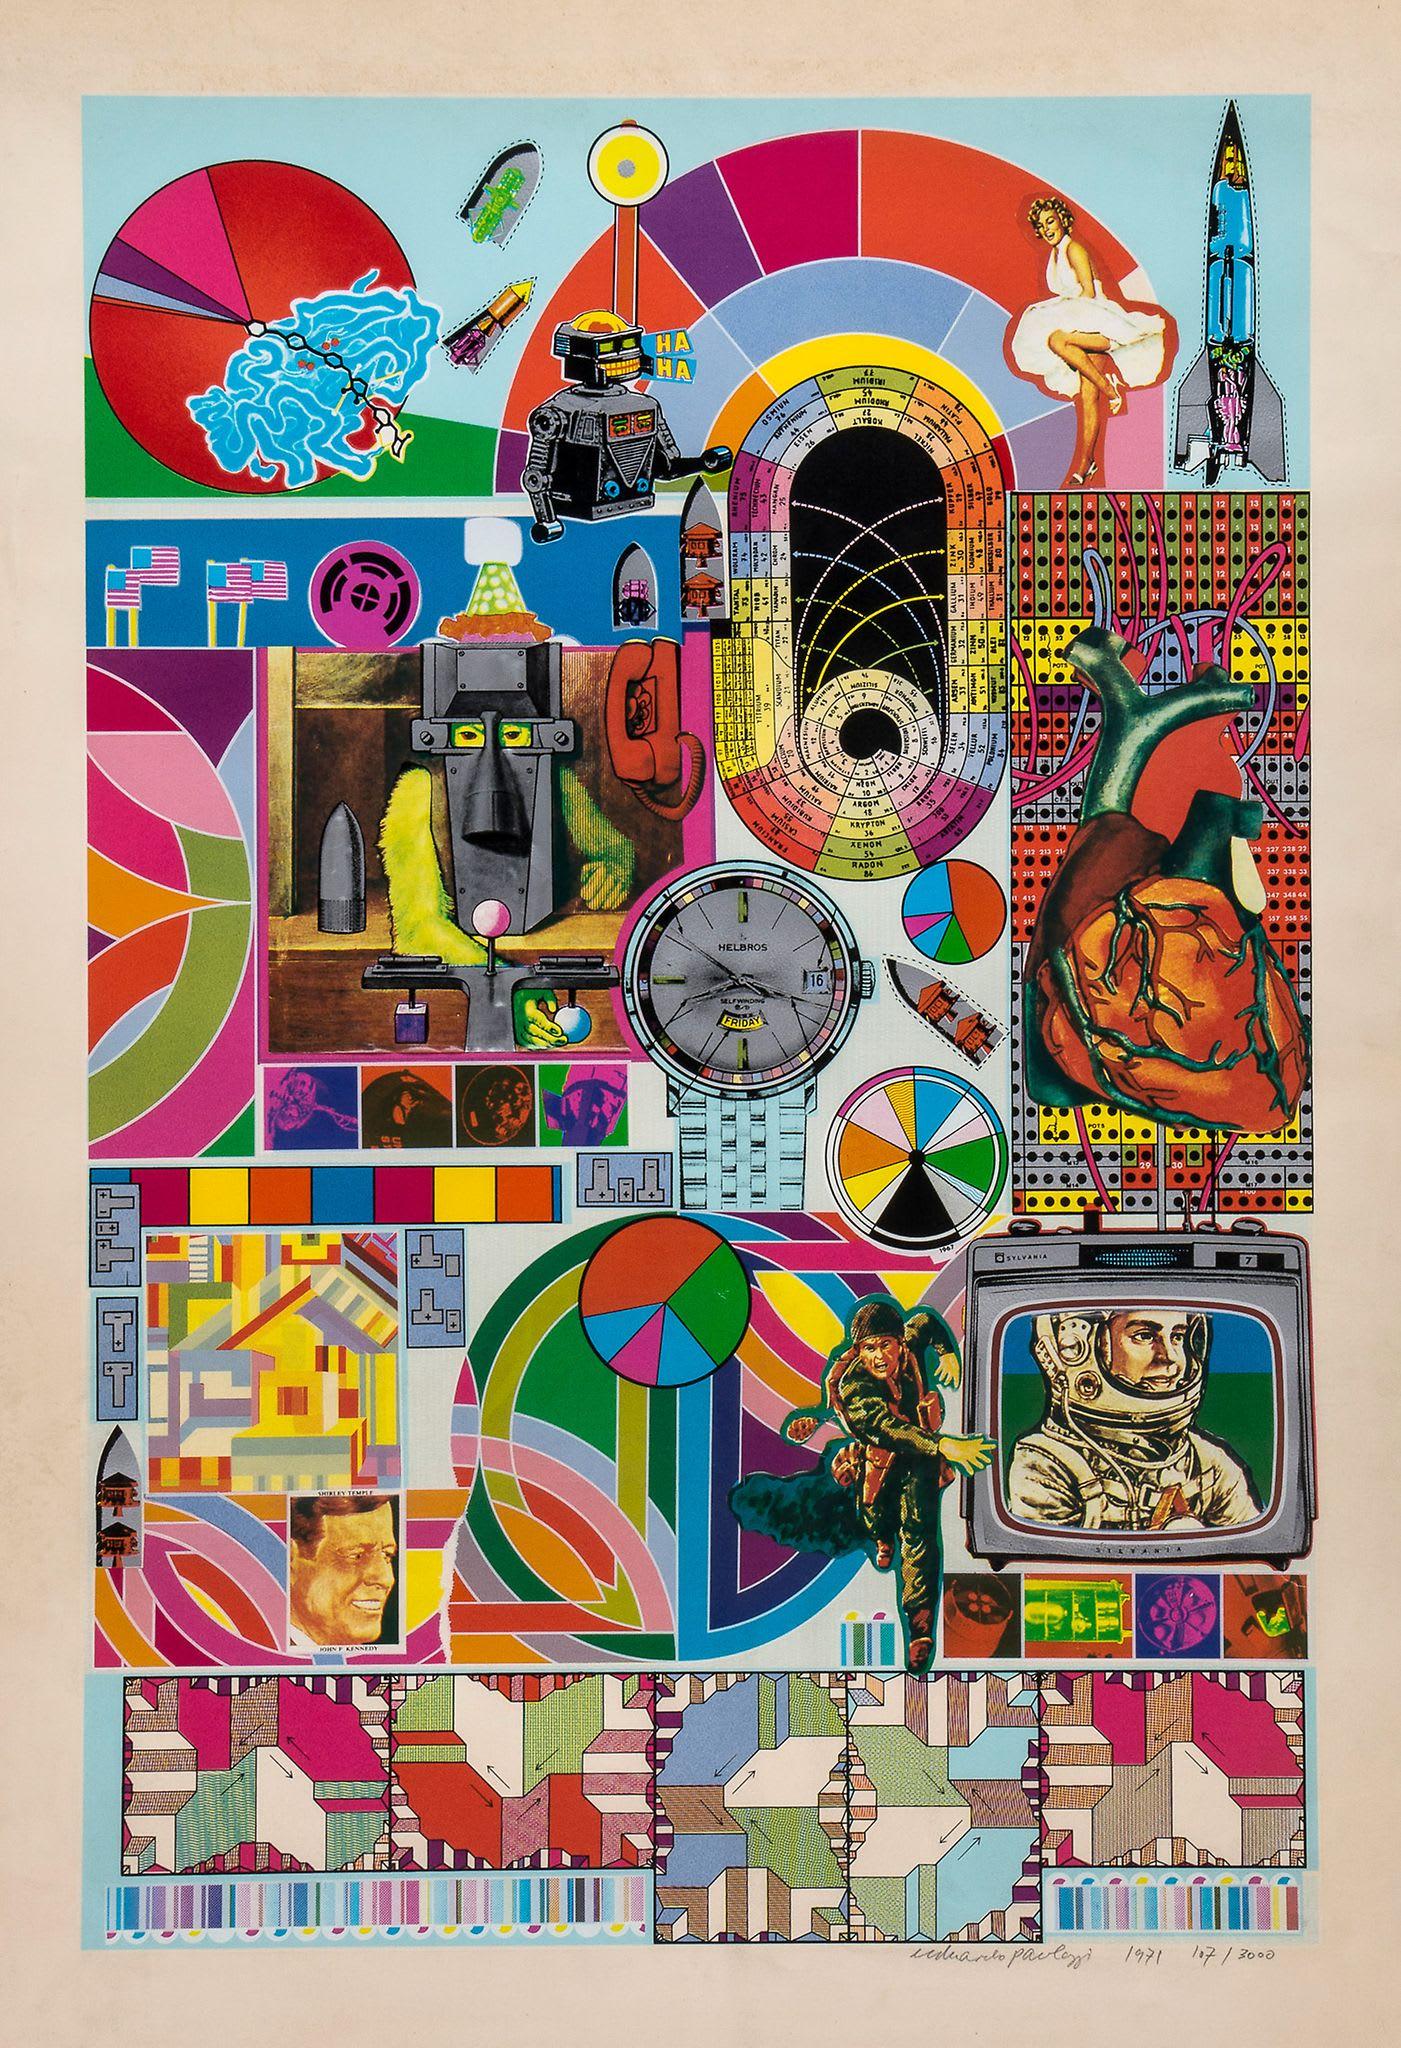 "<span class=""link fancybox-details-link""><a href=""/artists/60-eduardo-paolozzi/works/407-eduardo-paolozzi-b.a.s.h-blue-1971/"">View Detail Page</a></span><div class=""artist""><strong>Eduardo Paolozzi</strong></div> <div class=""title""><em>B.A.S.H (Blue)</em>, 1971</div> <div class=""signed_and_dated"">Stamped Paolozzi Foundation</div> <div class=""medium"">Screenprint - AP </div> <div class=""dimensions"">84.5 x 59cm</div><div class=""price"">£1,600.00</div>"